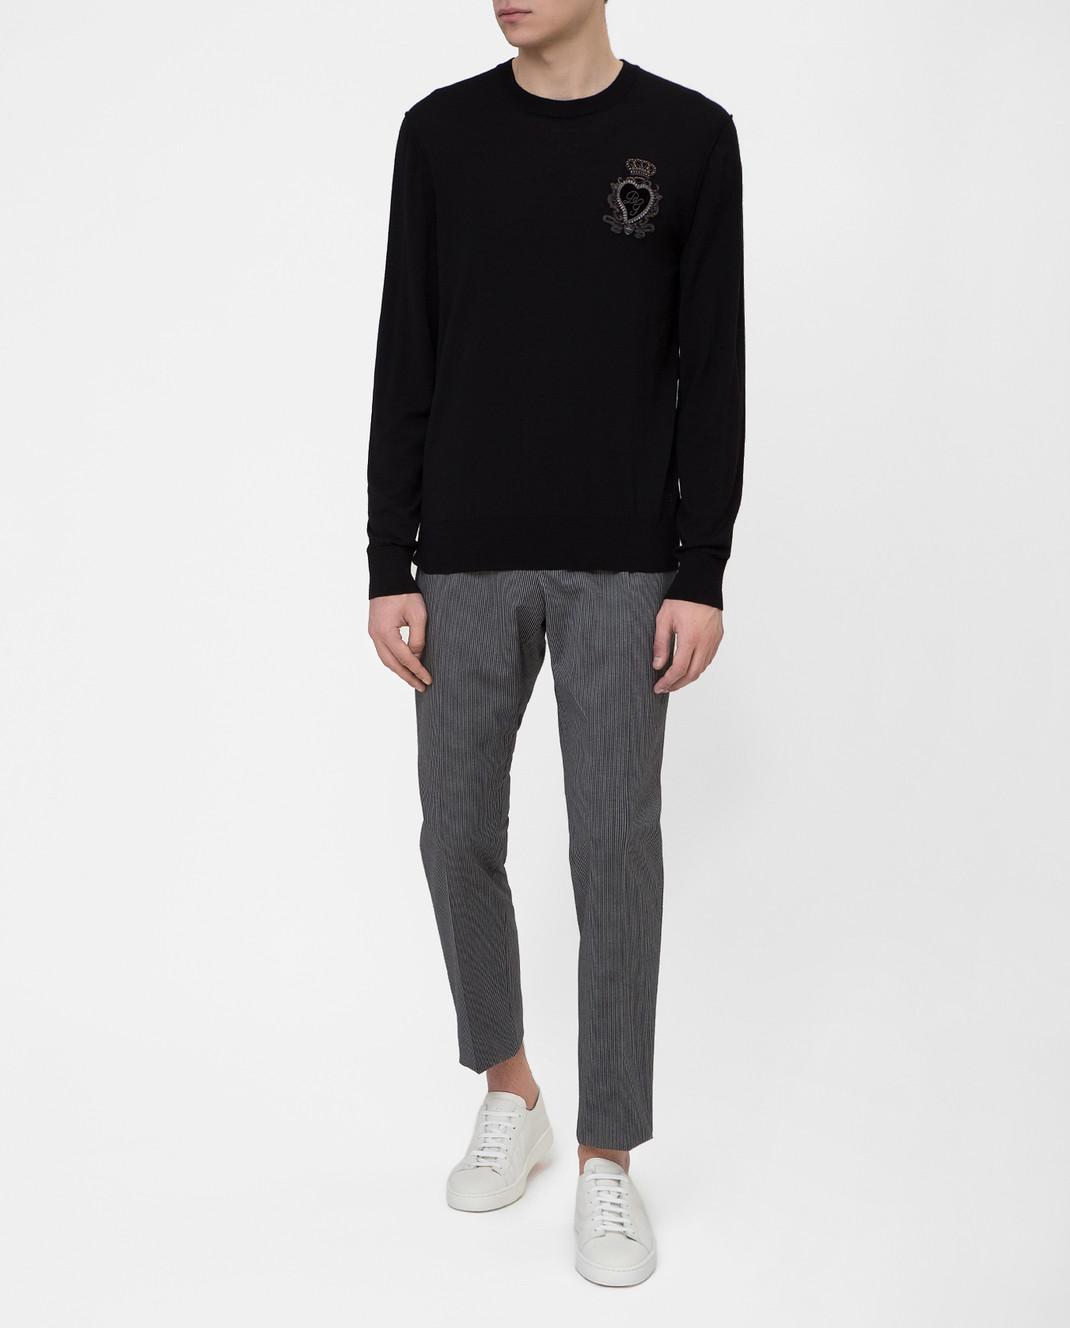 Dolce&Gabbana Серые брюки GYIJETFRCBQ изображение 2